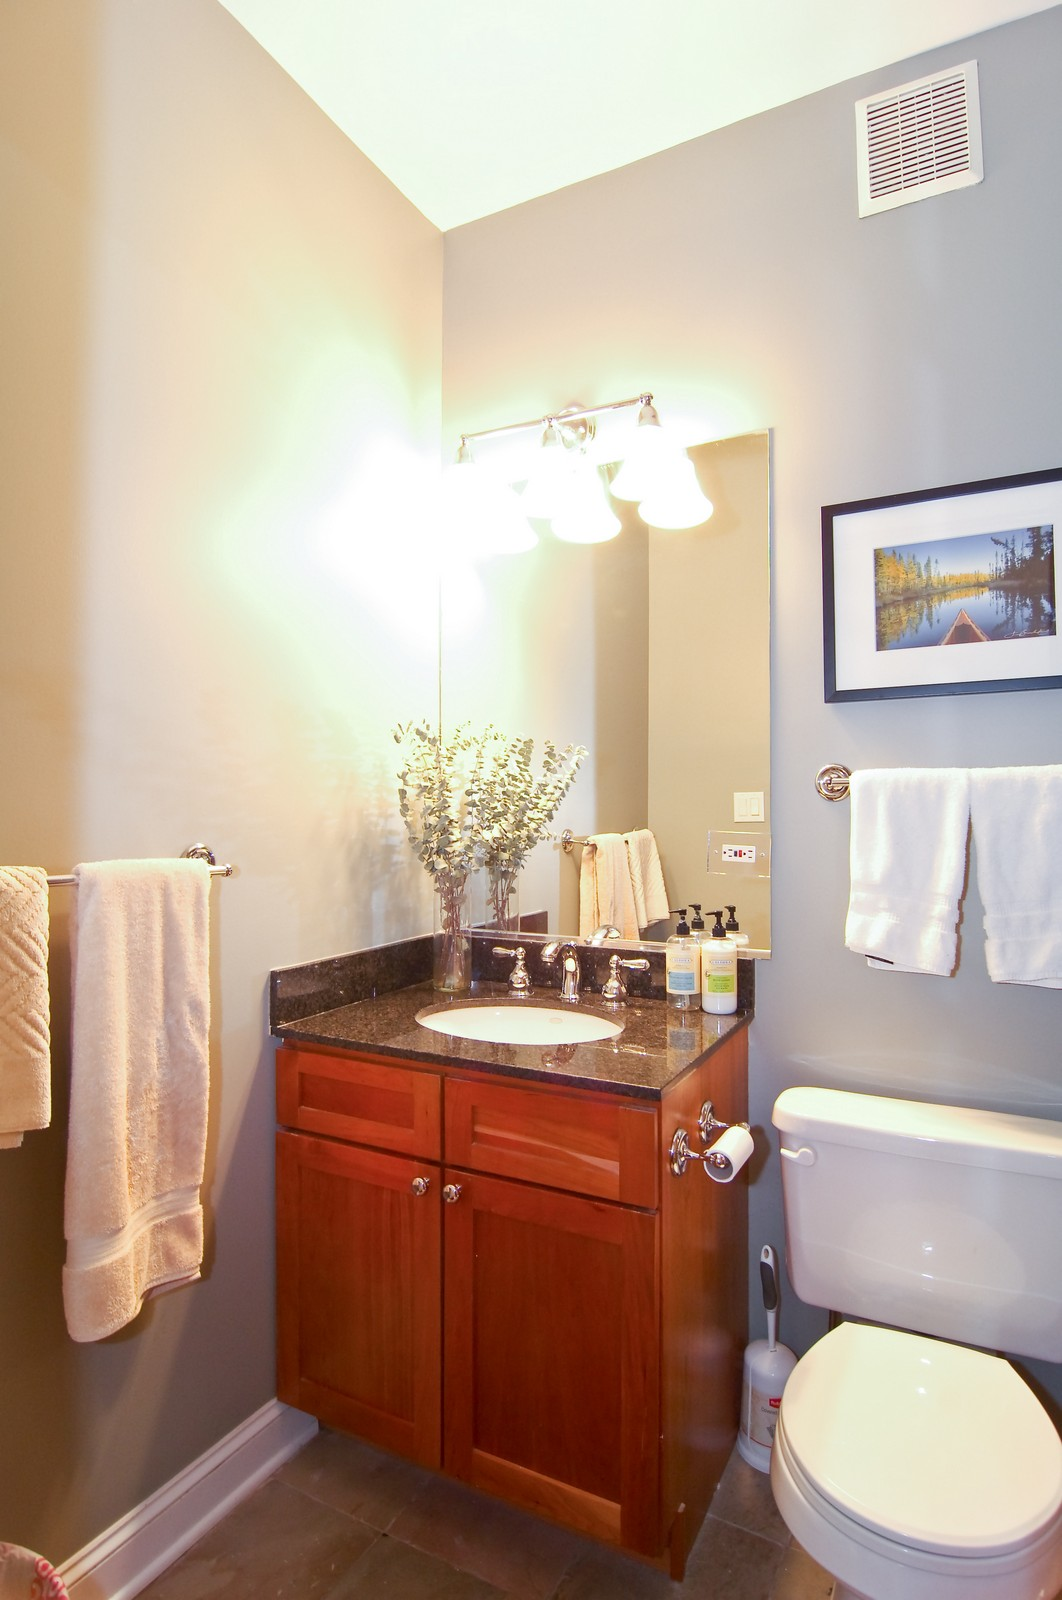 Real Estate Photography - 1865 N Winnebago, Unit 4, Chicago, IL, 60647 - Bathroom